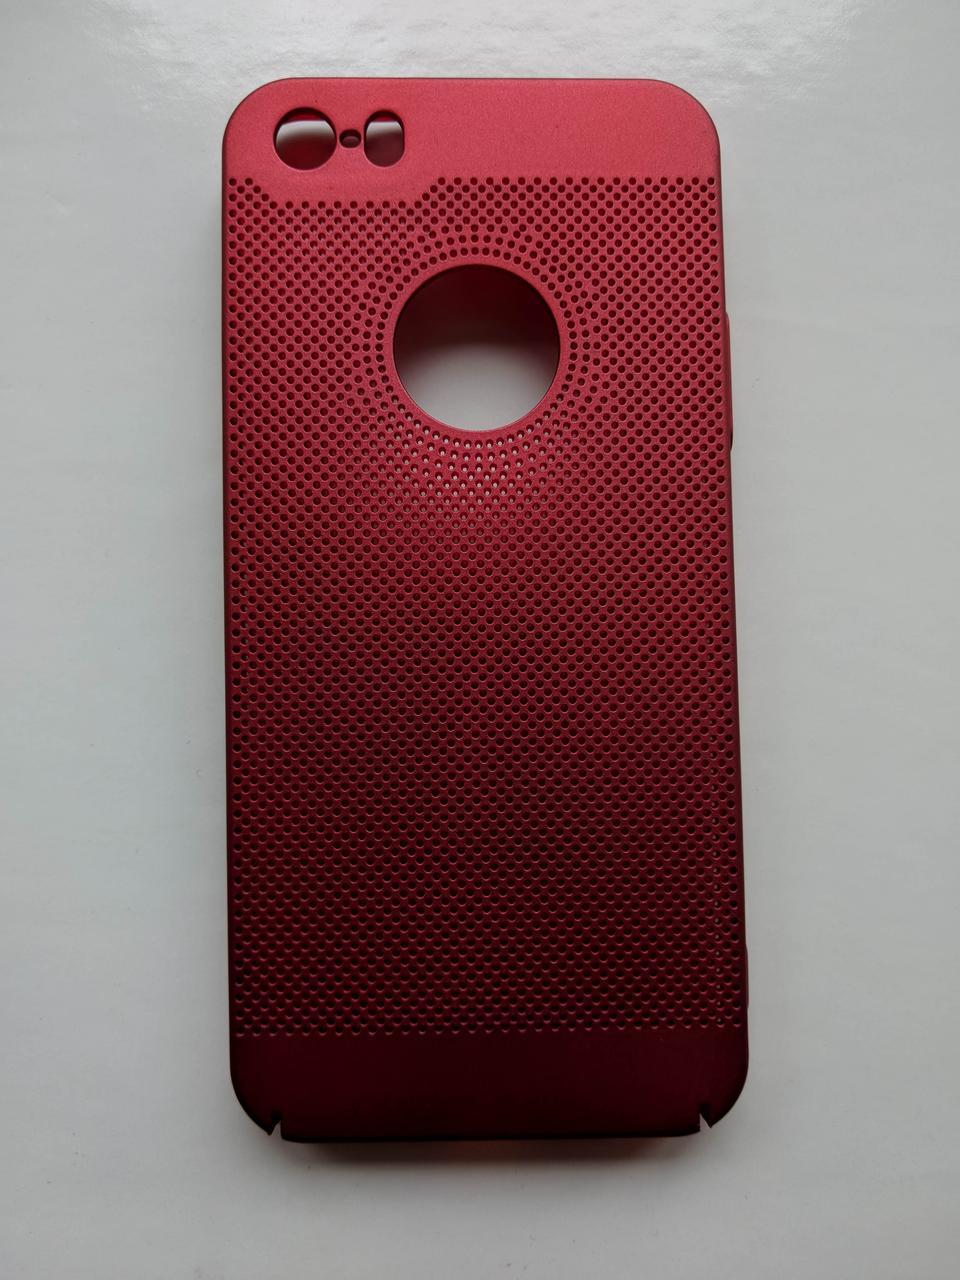 Стильний чохол на iPhone 5 / 5s / SE